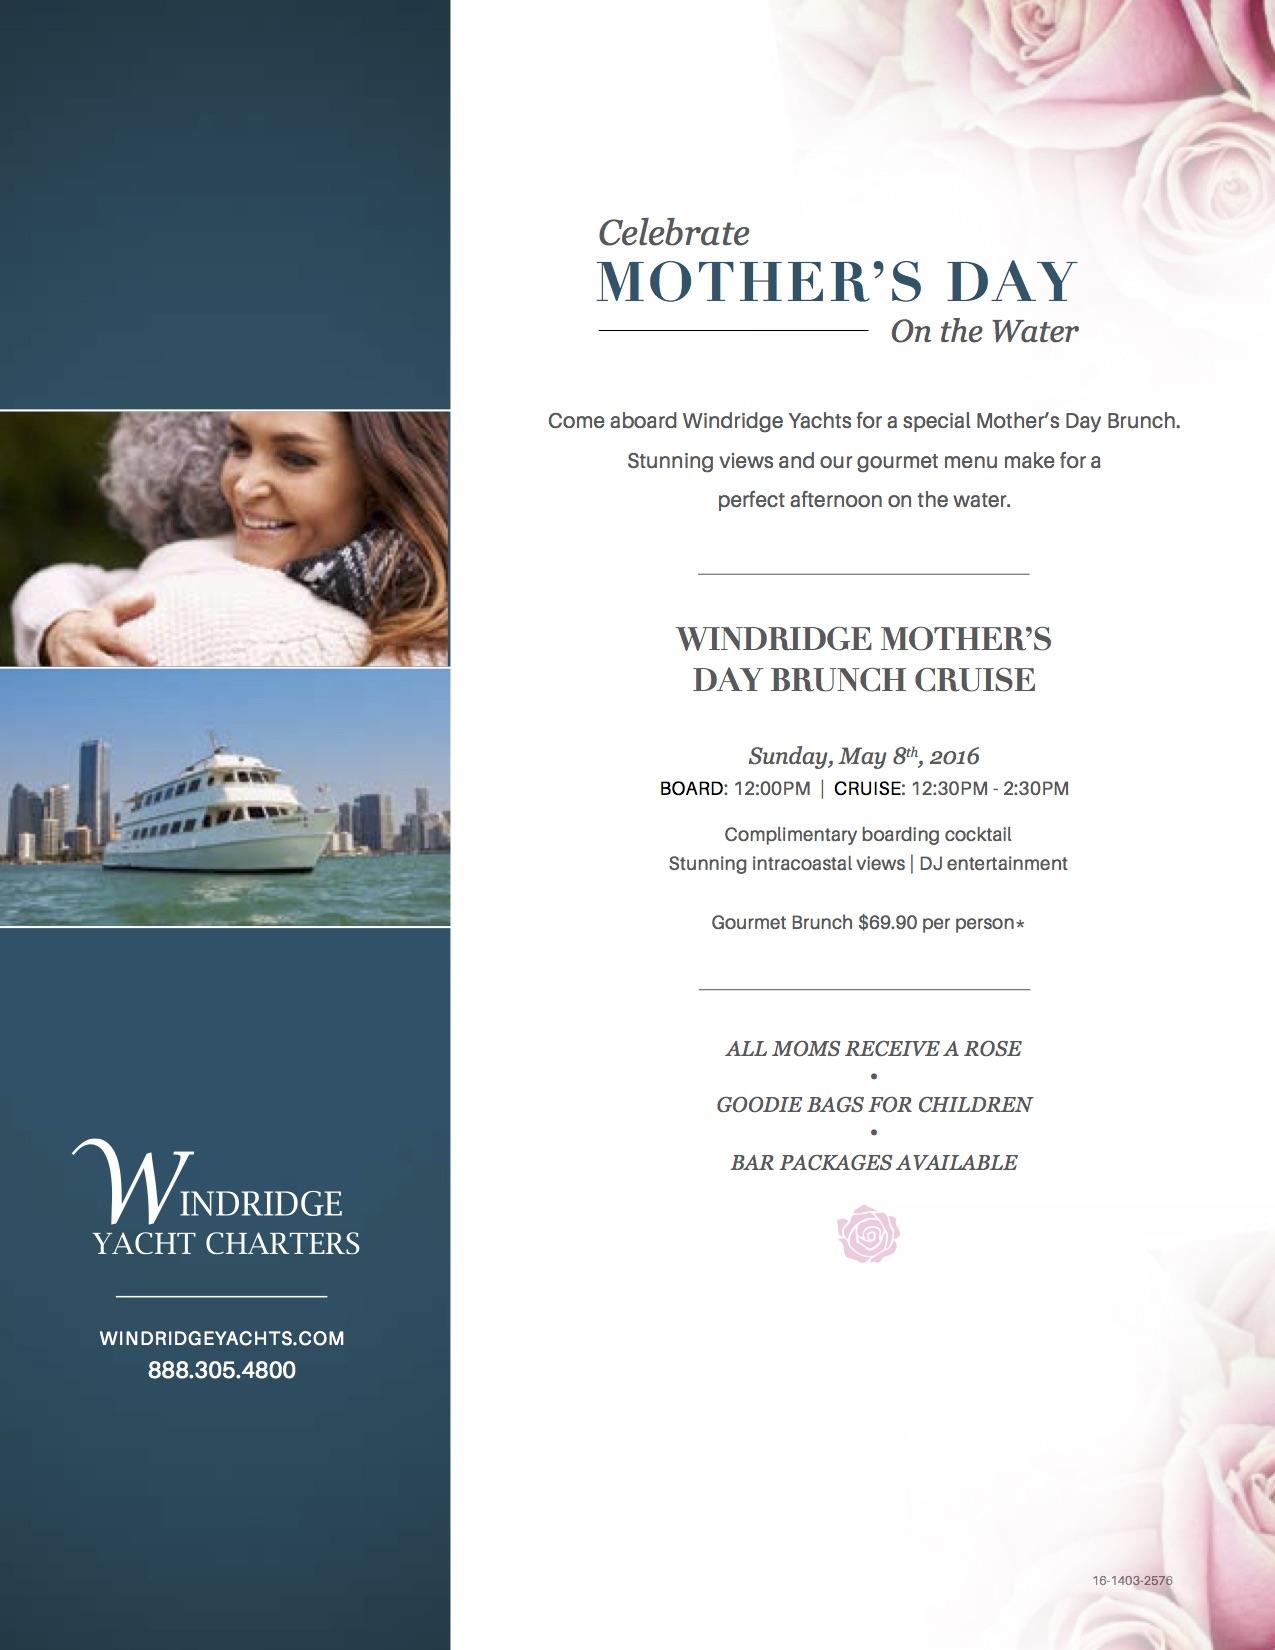 Windridge Mother's Day Brunch copy